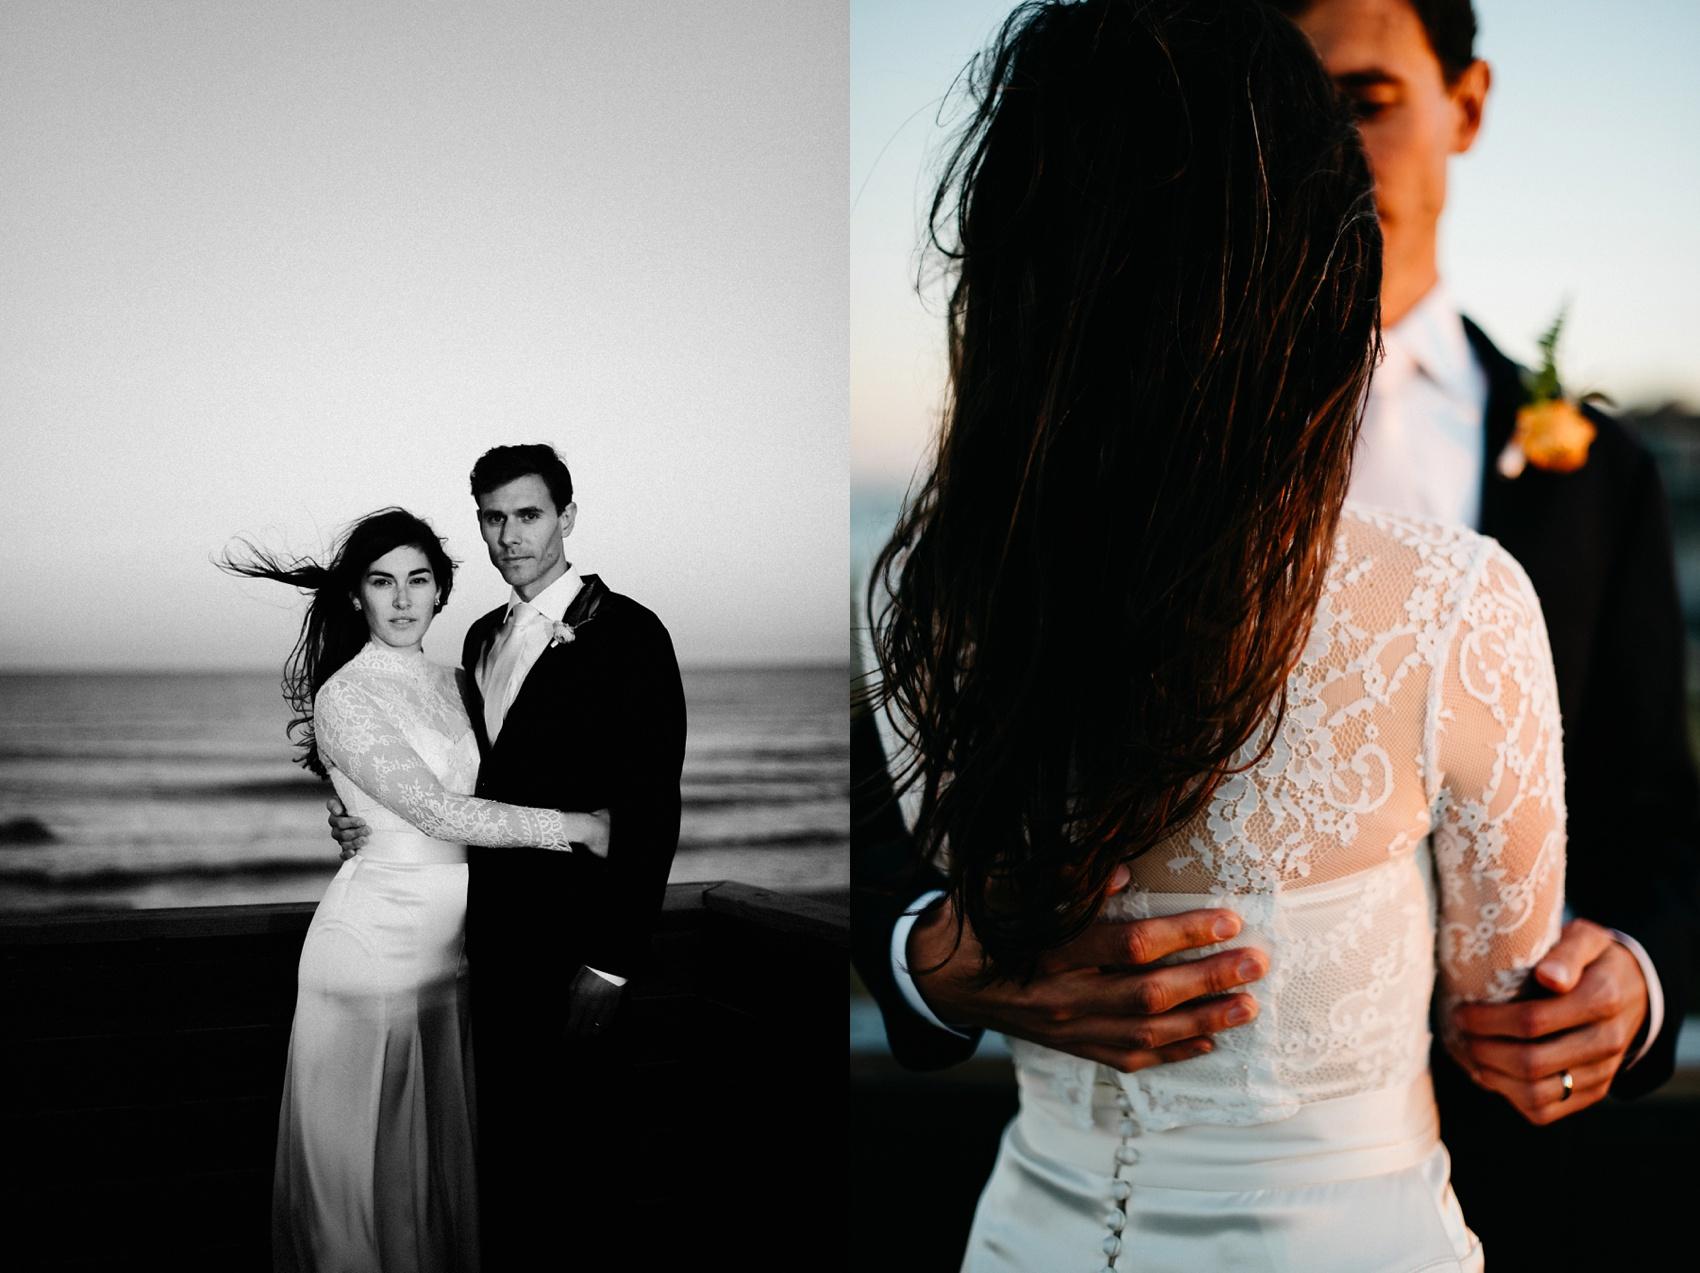 outerbanks_wedding_photographer_1317.jpg